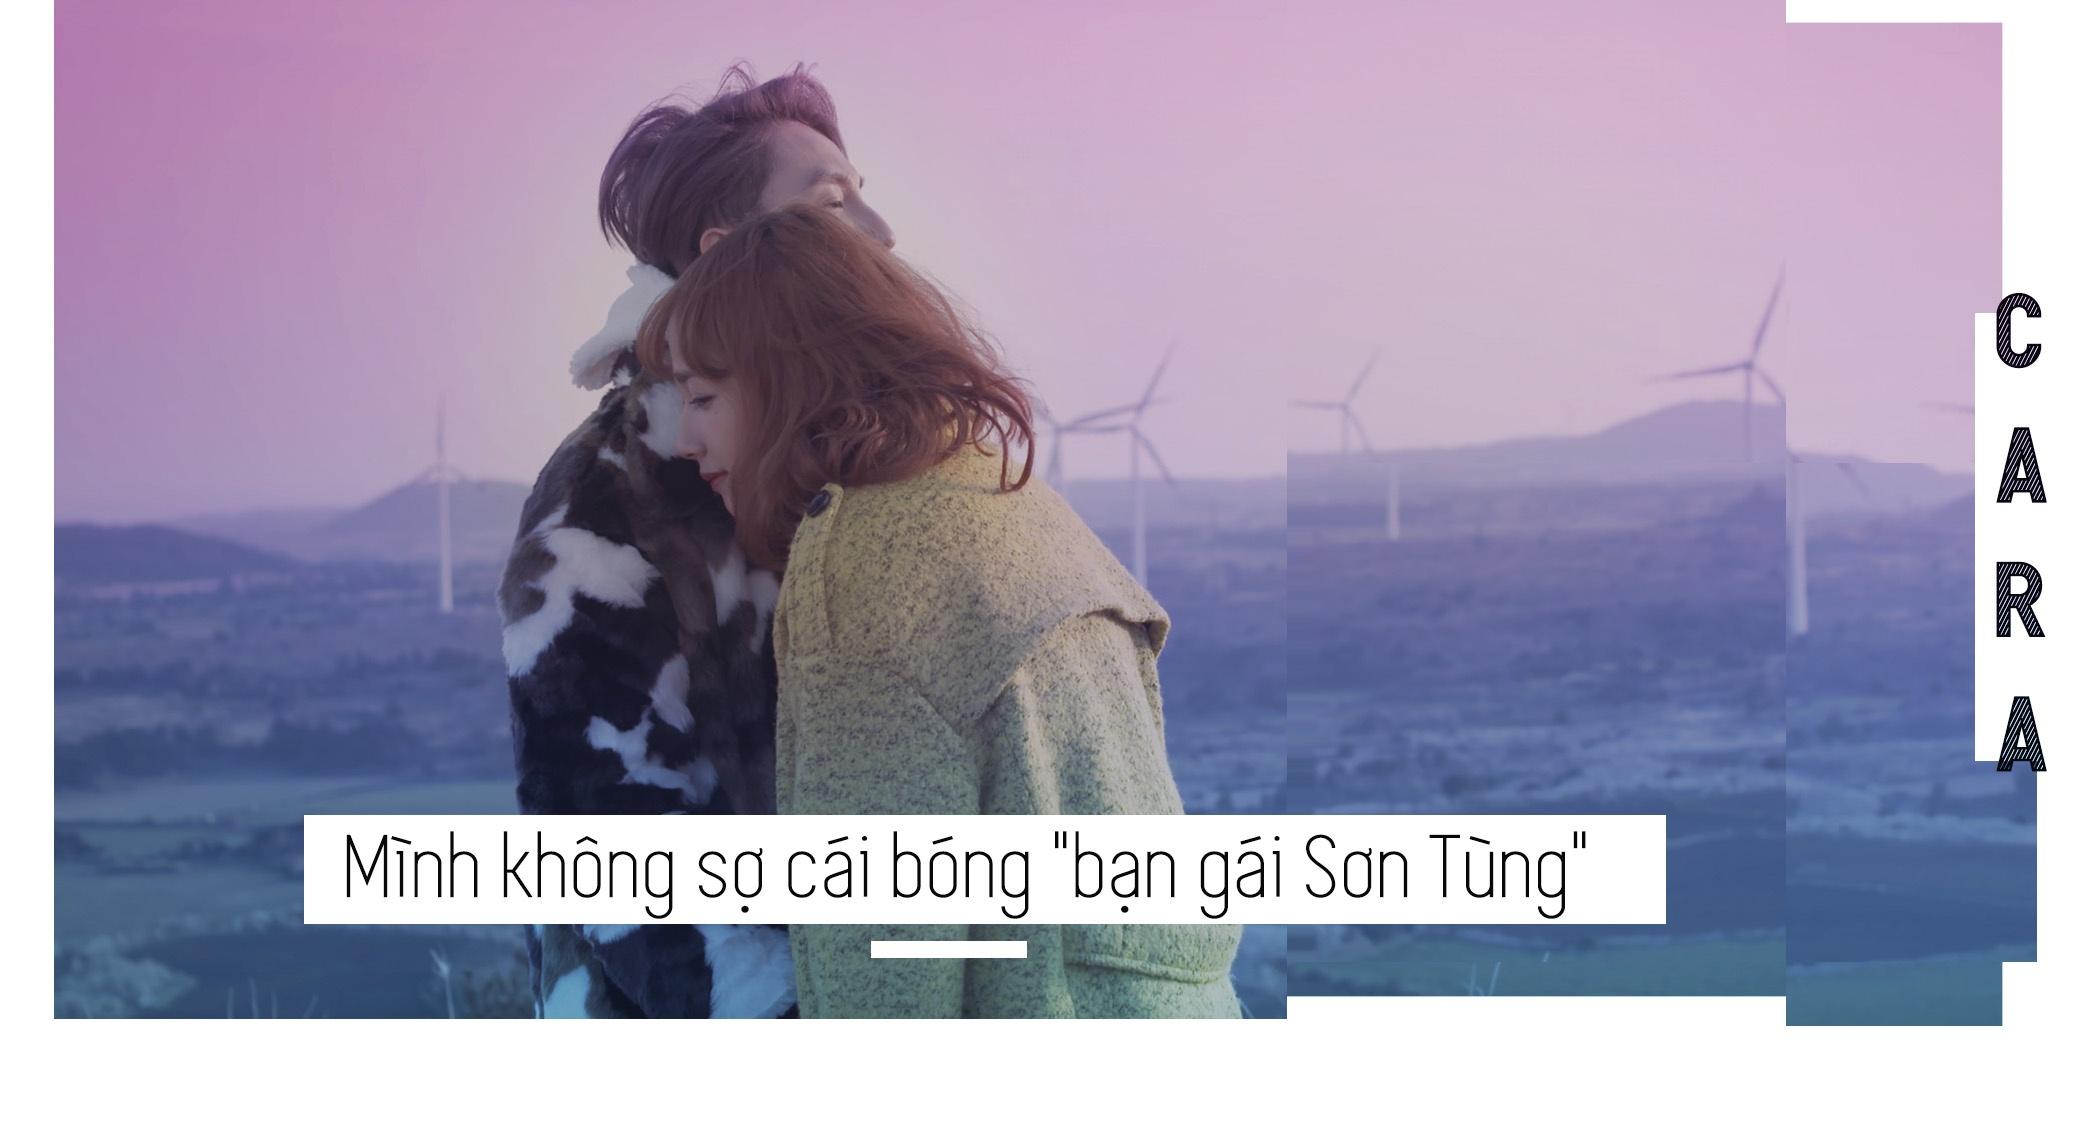 Cara: Minh se vuot qua cai bong 'ban gai Son Tung M-TP' hinh anh 7